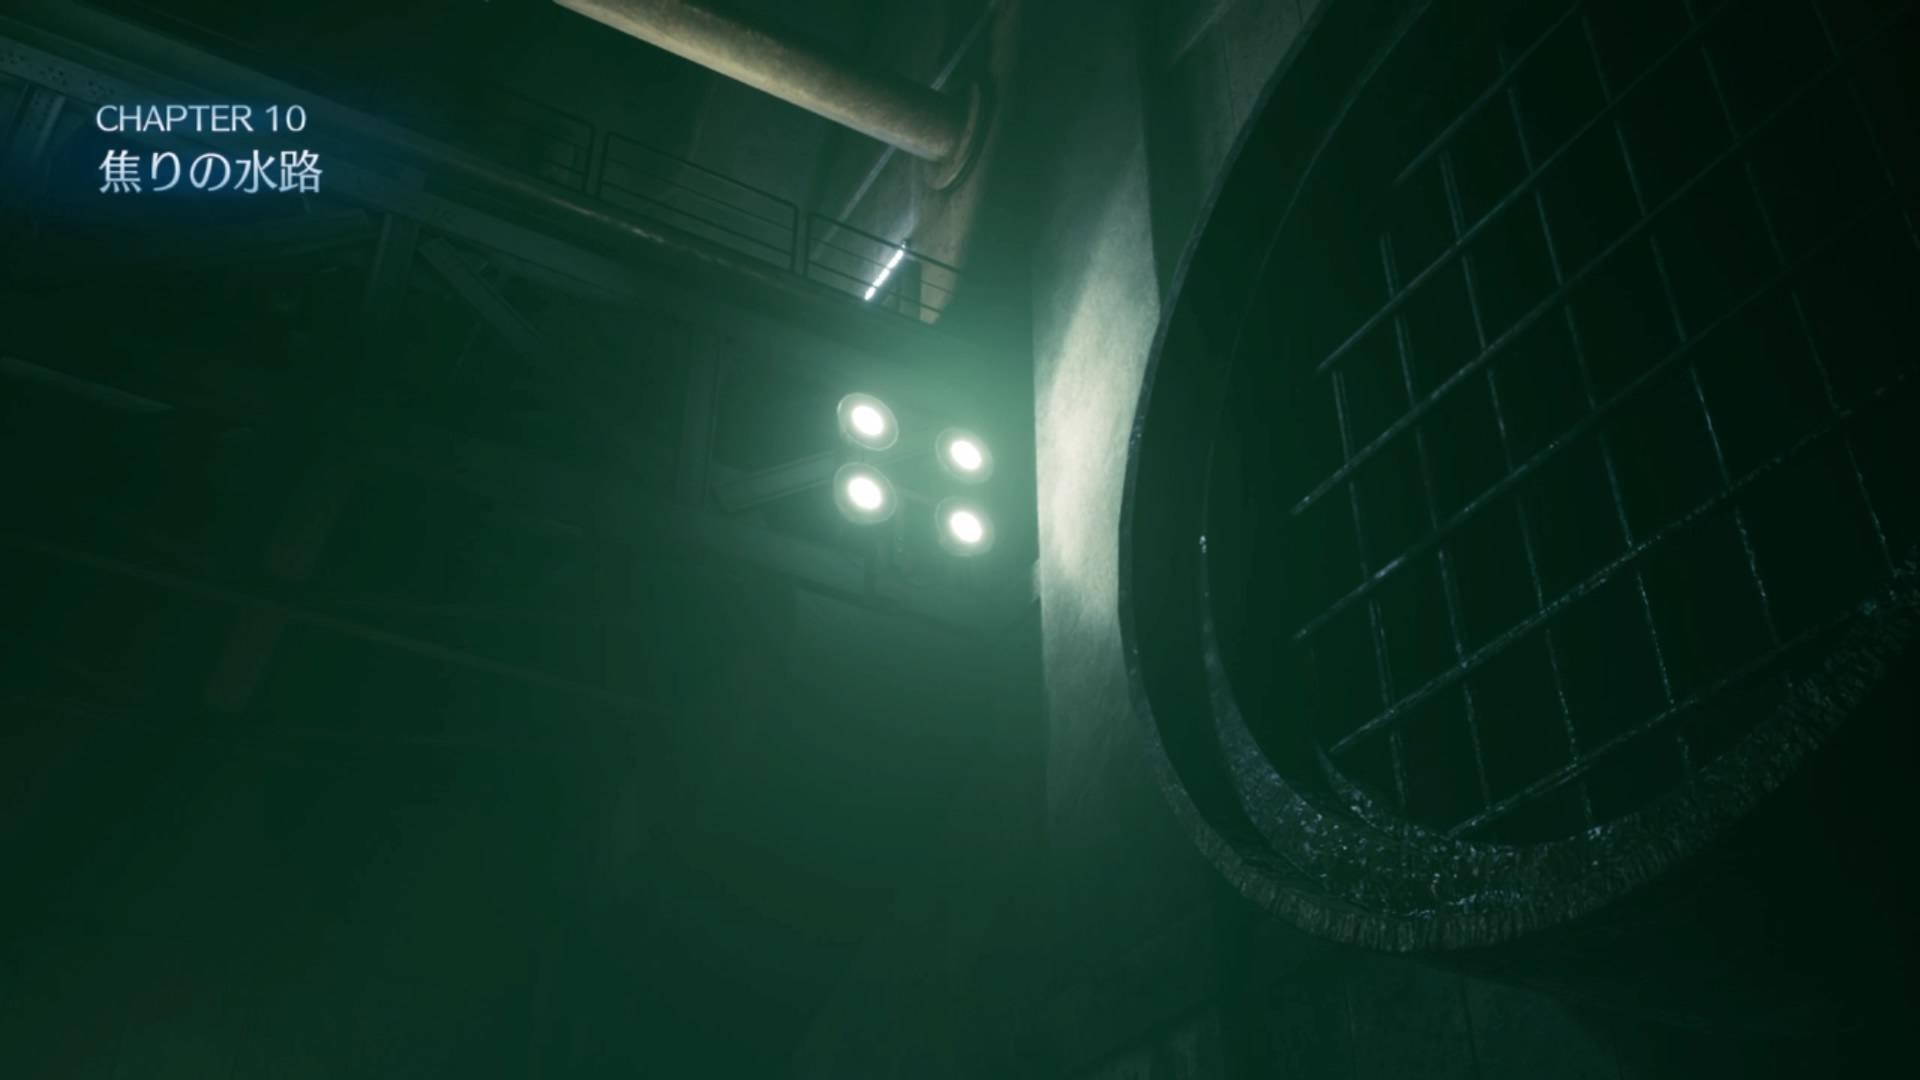 【FF7REMAKE】第44回攻略・感想~下水道から七番街を目指せ!~